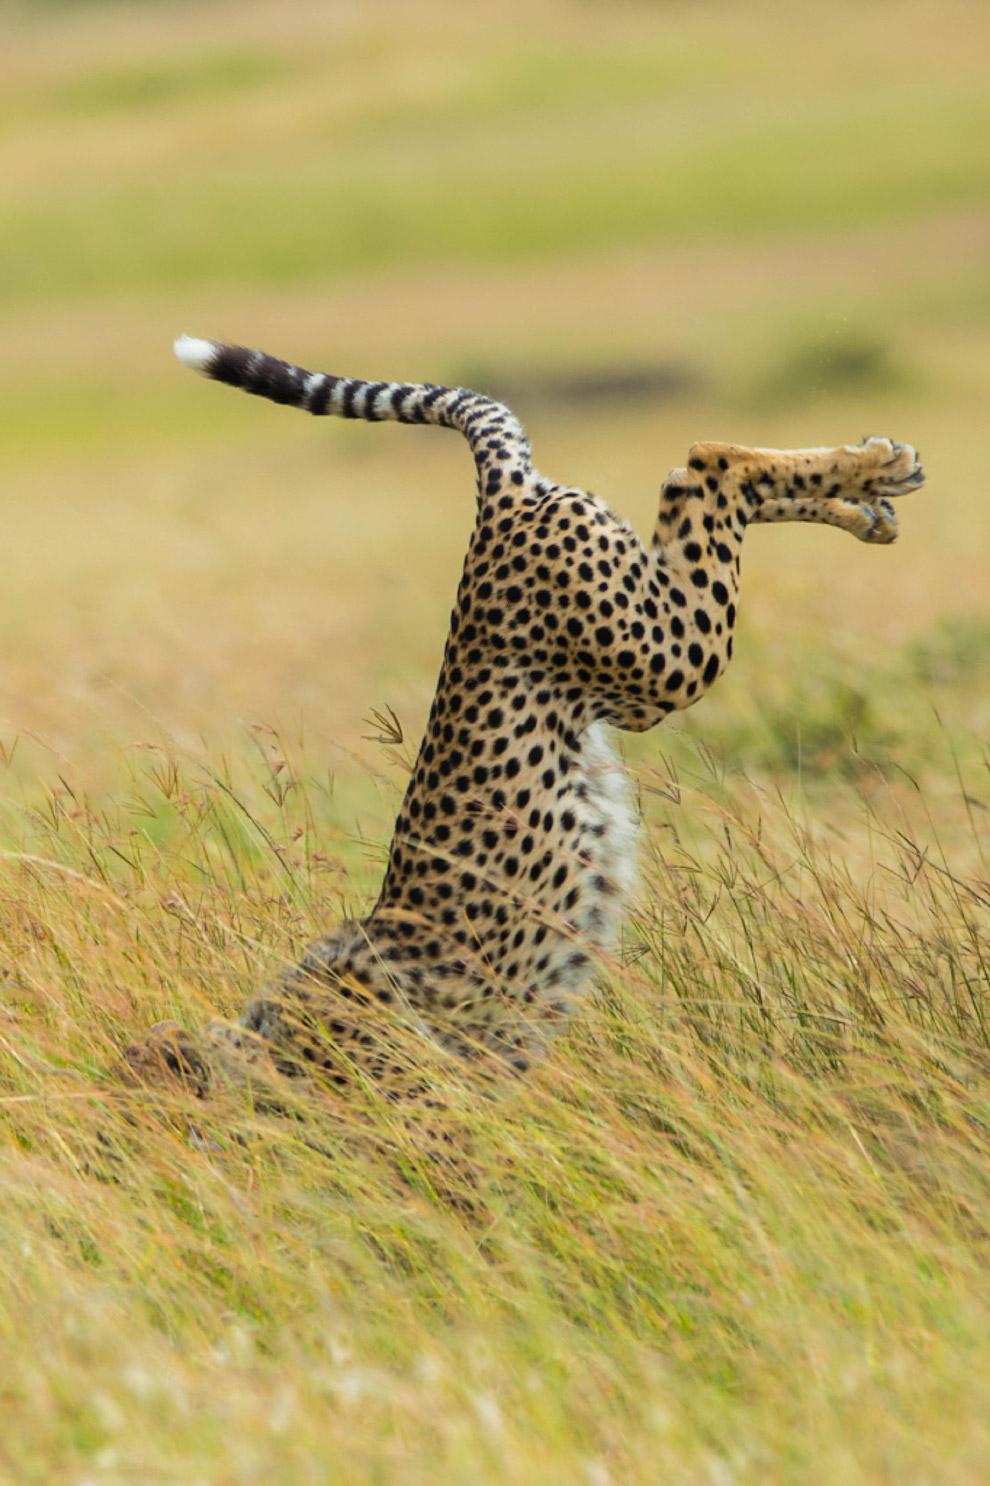 11. Отличная шутка! (Фото Jeff Derx | Comedy Wildlife Photography Awards):